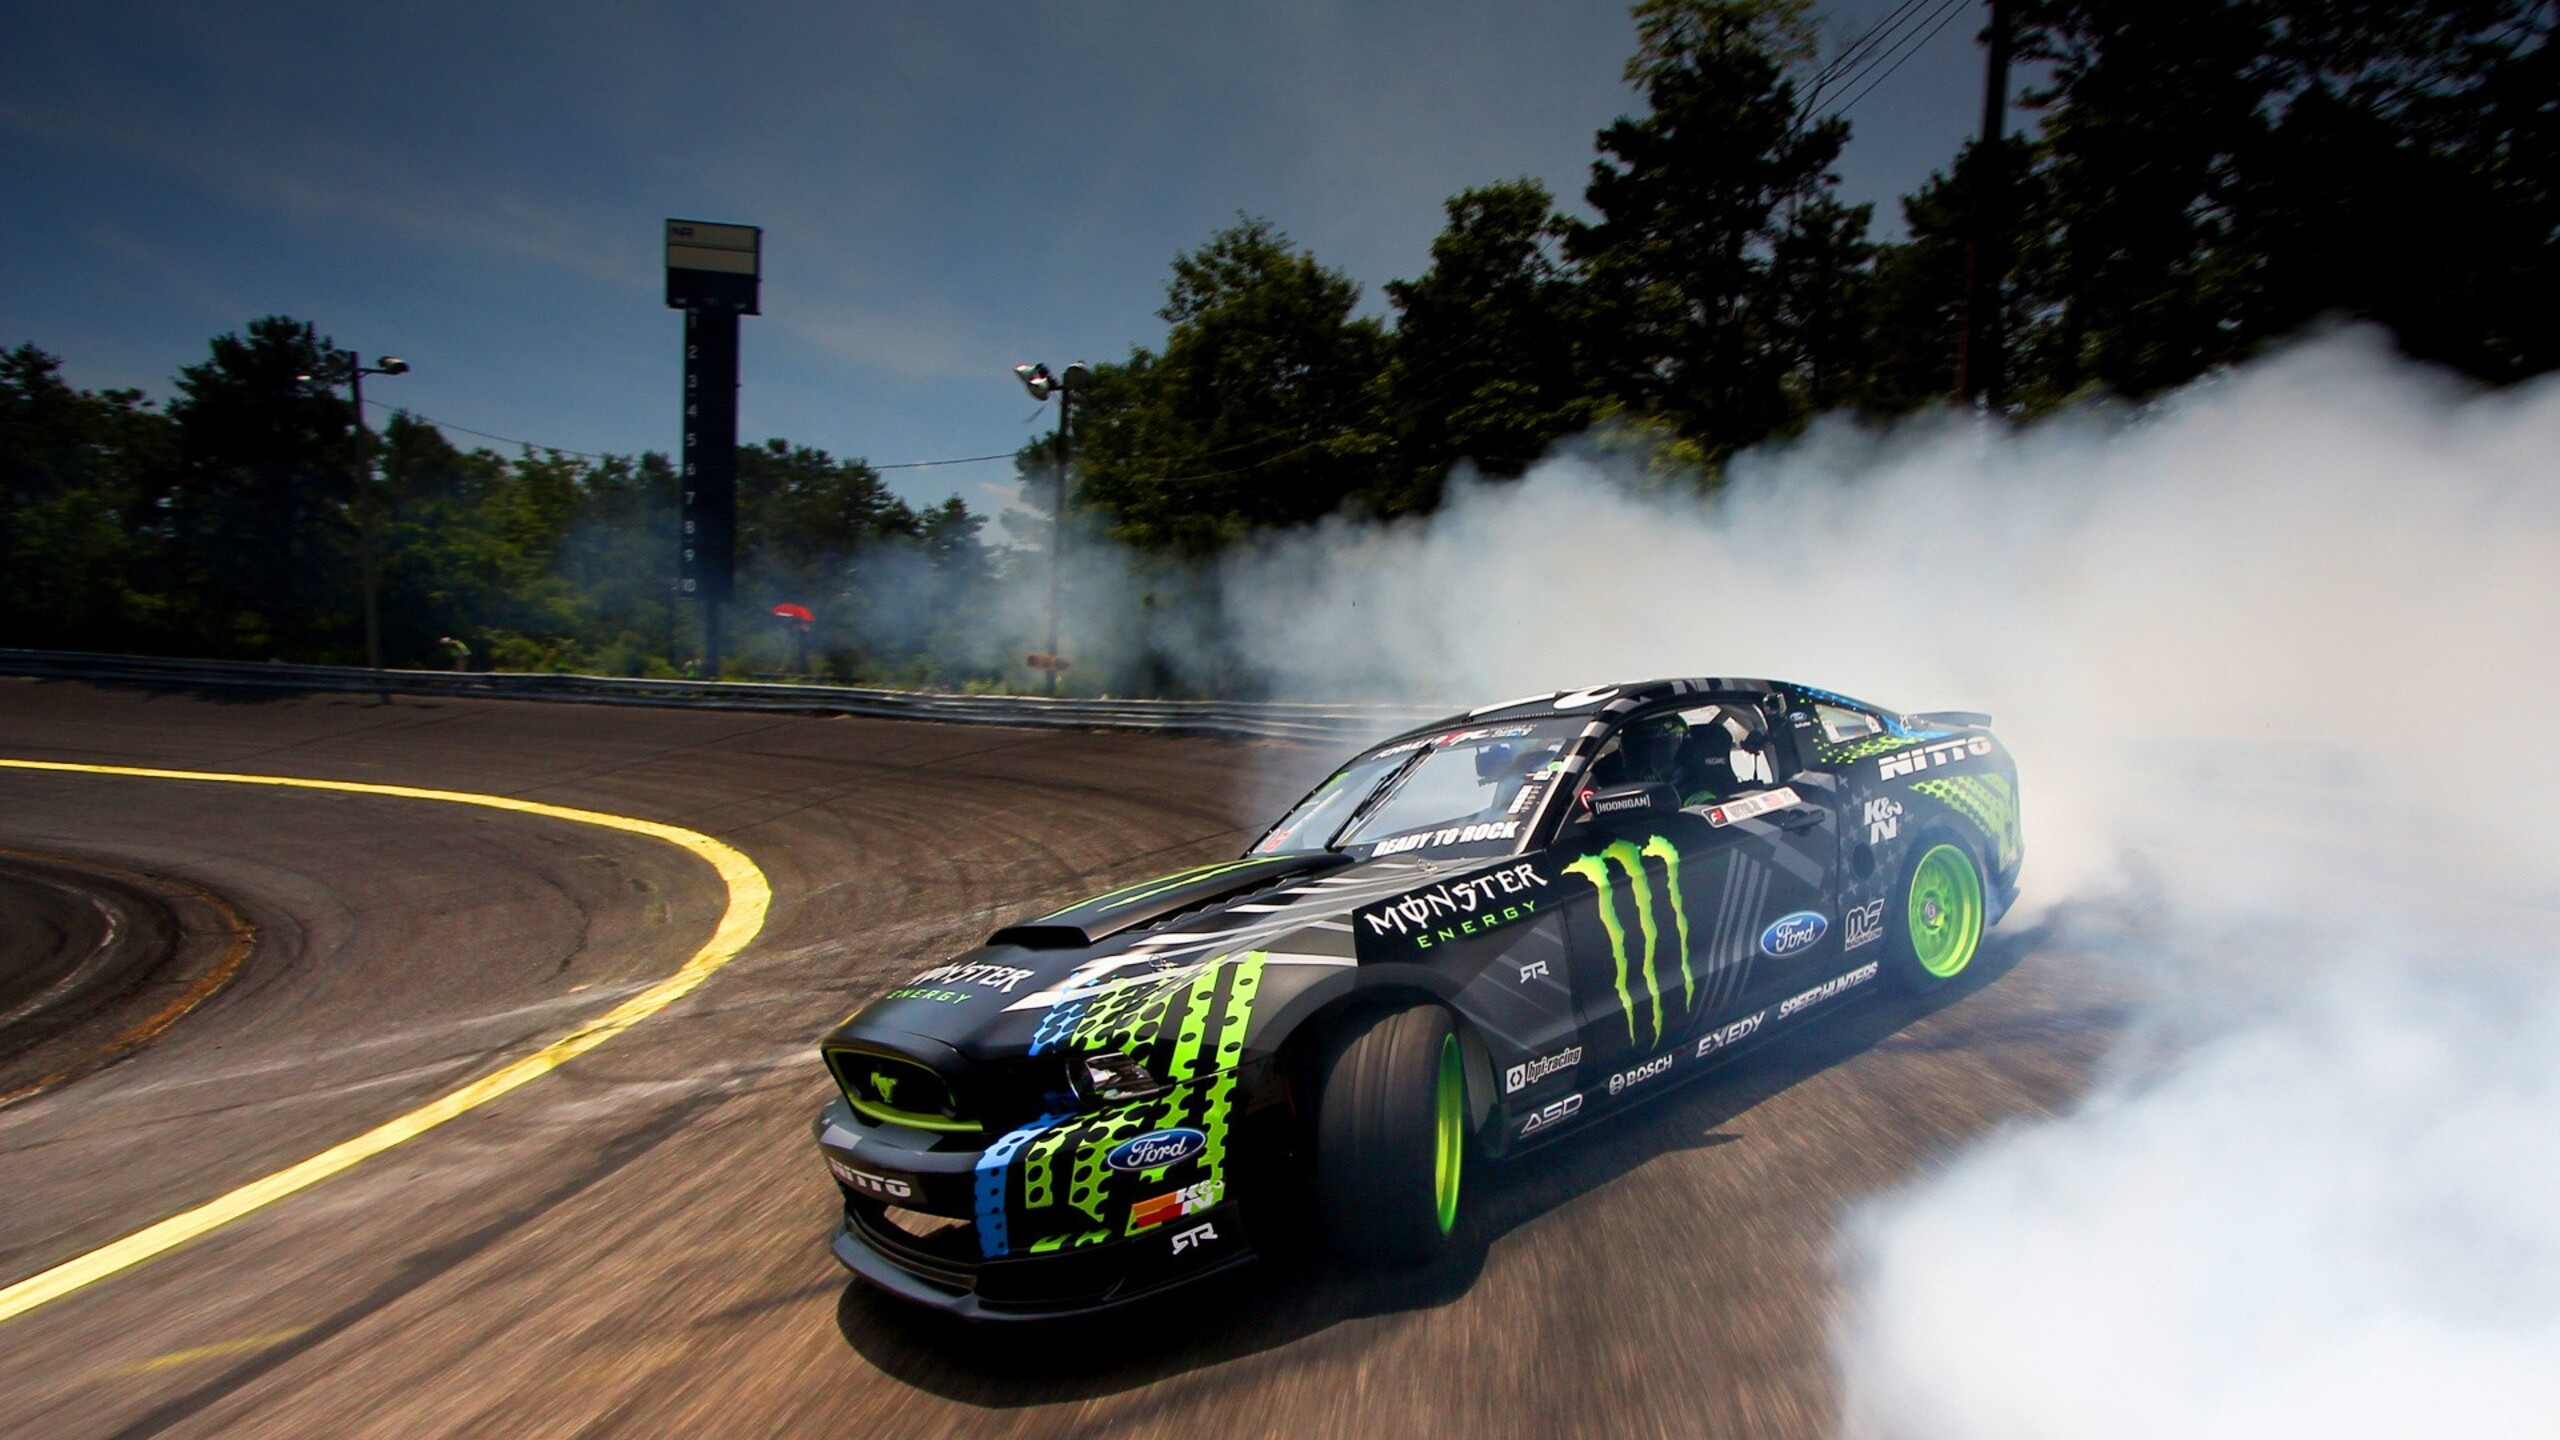 2560x1440 Ford Monster Drifting Smoke 1440P Resolution HD ...